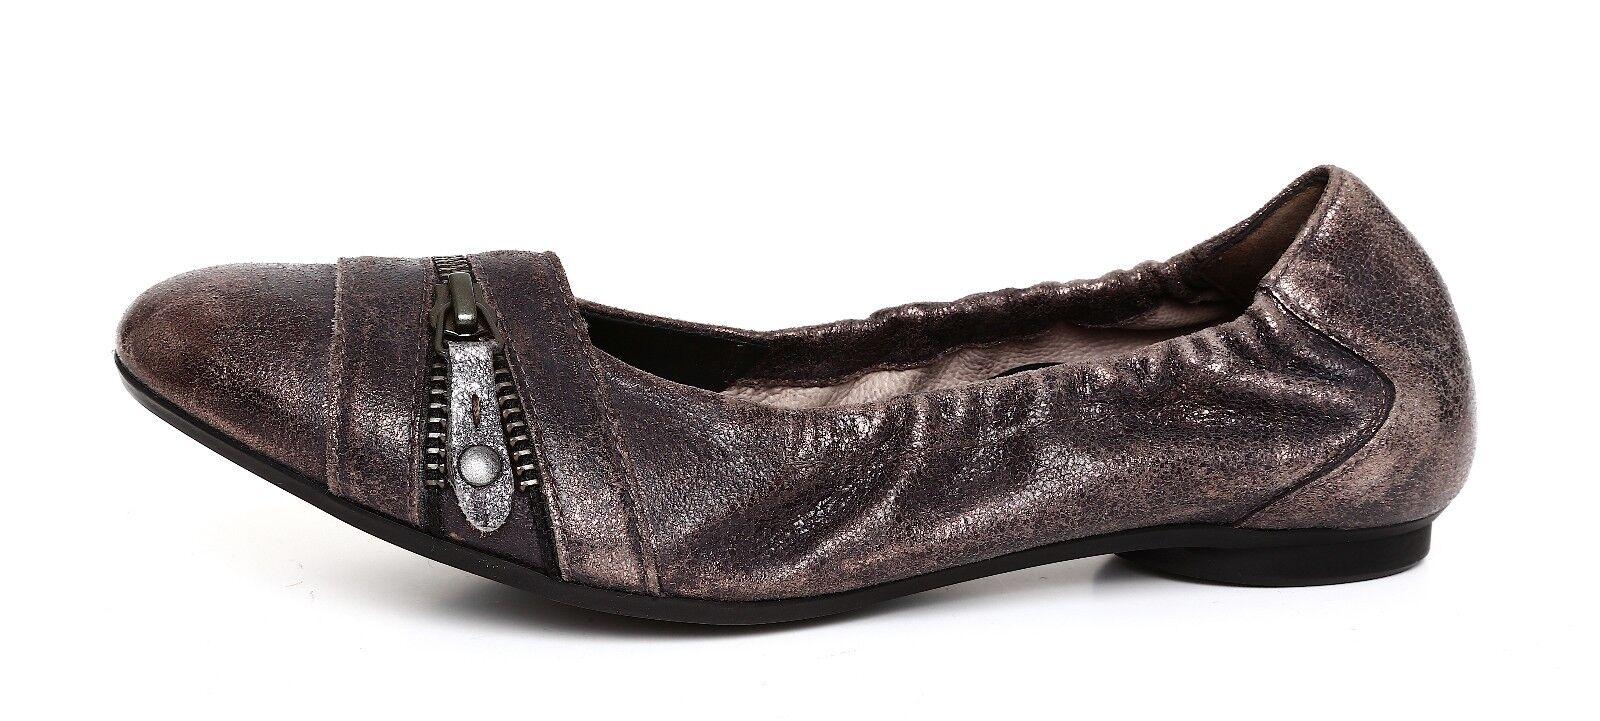 Paul Green Women's Metallic Slip On Leather Flats Sz 3.5